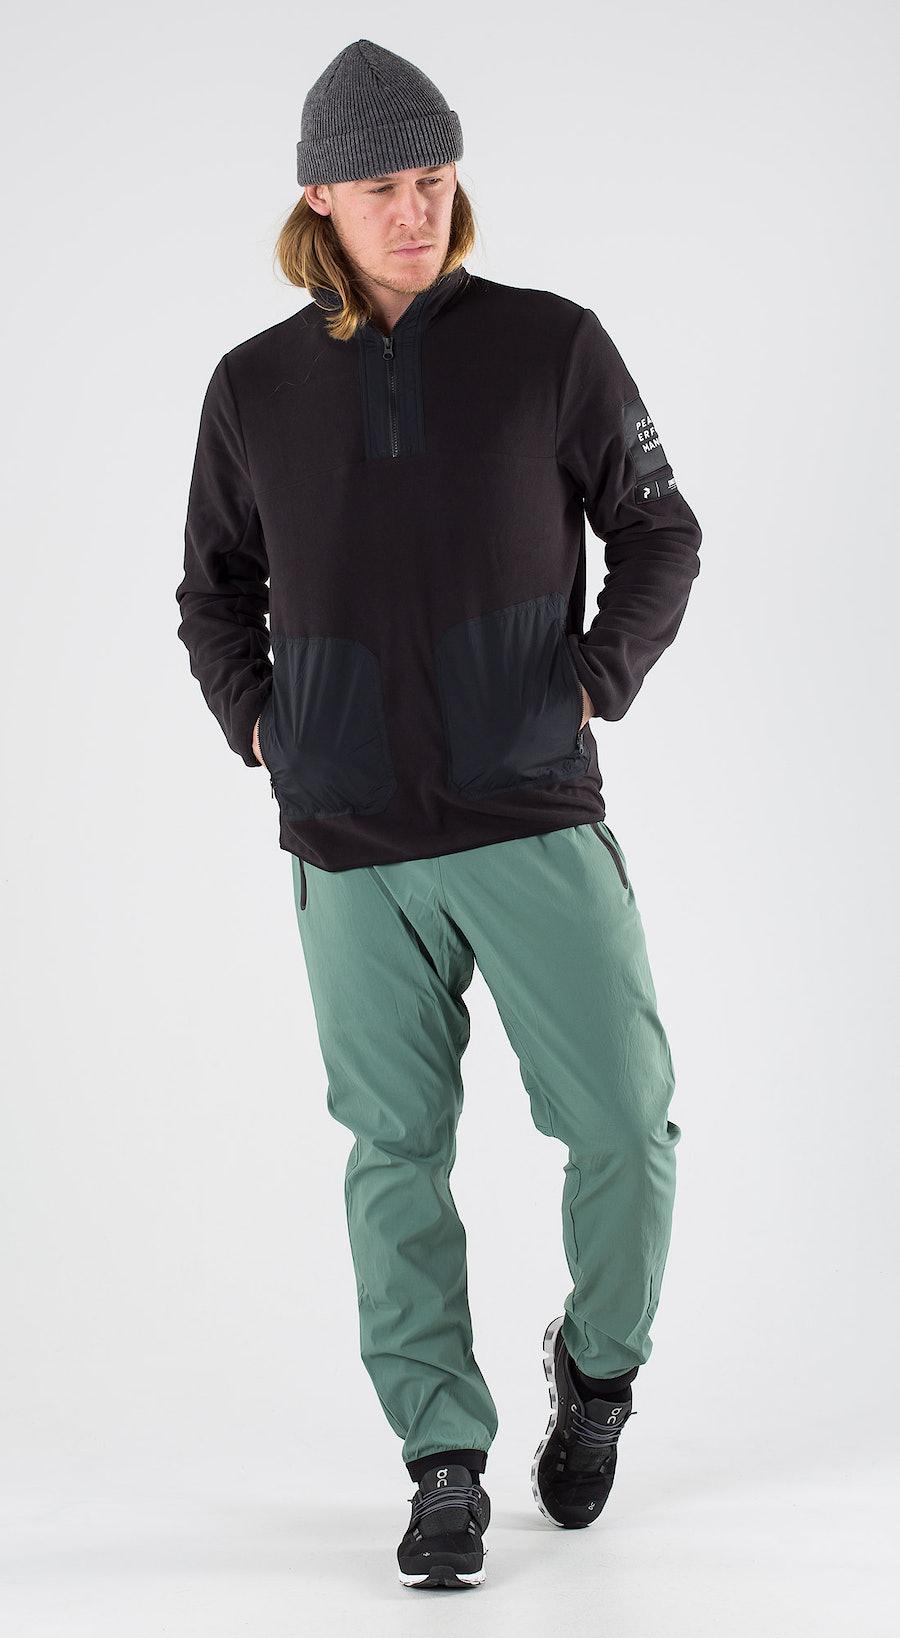 Peak Performance Tech Fleece TN Black Outfit Multi